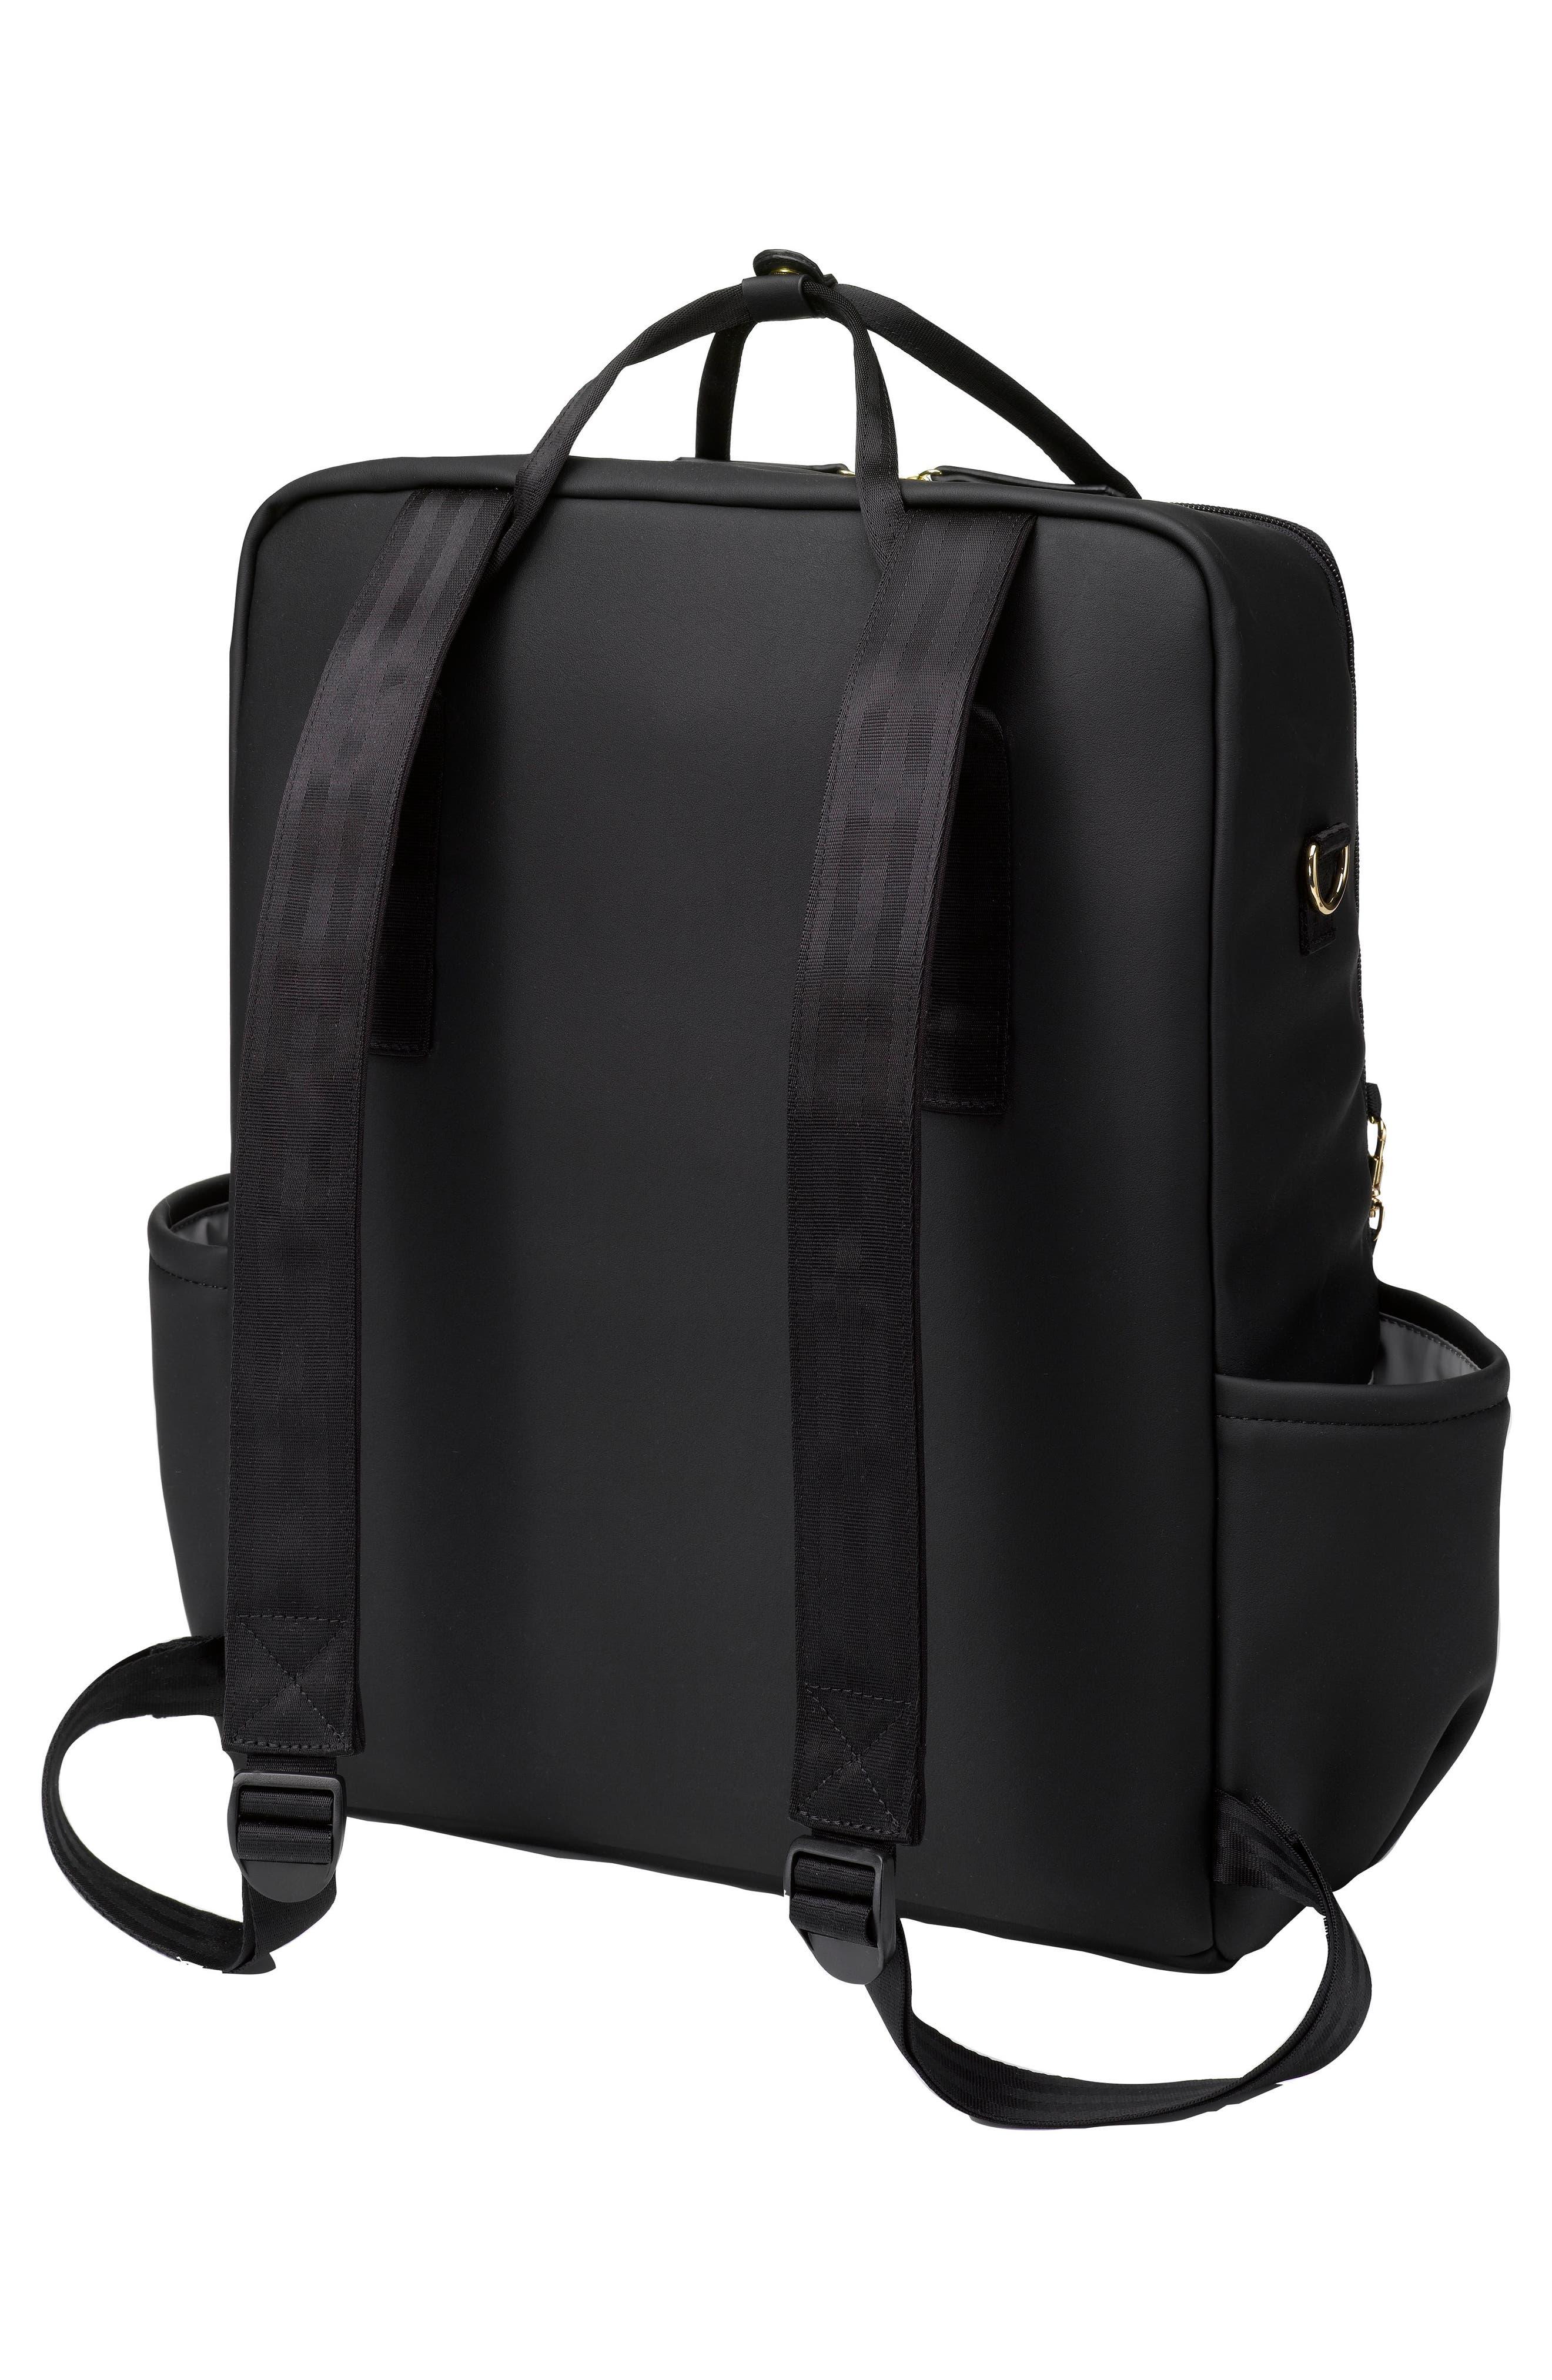 Balance Backpack Diaper Bag,                             Alternate thumbnail 2, color,                             BLACK MATTE LEATHERETTE